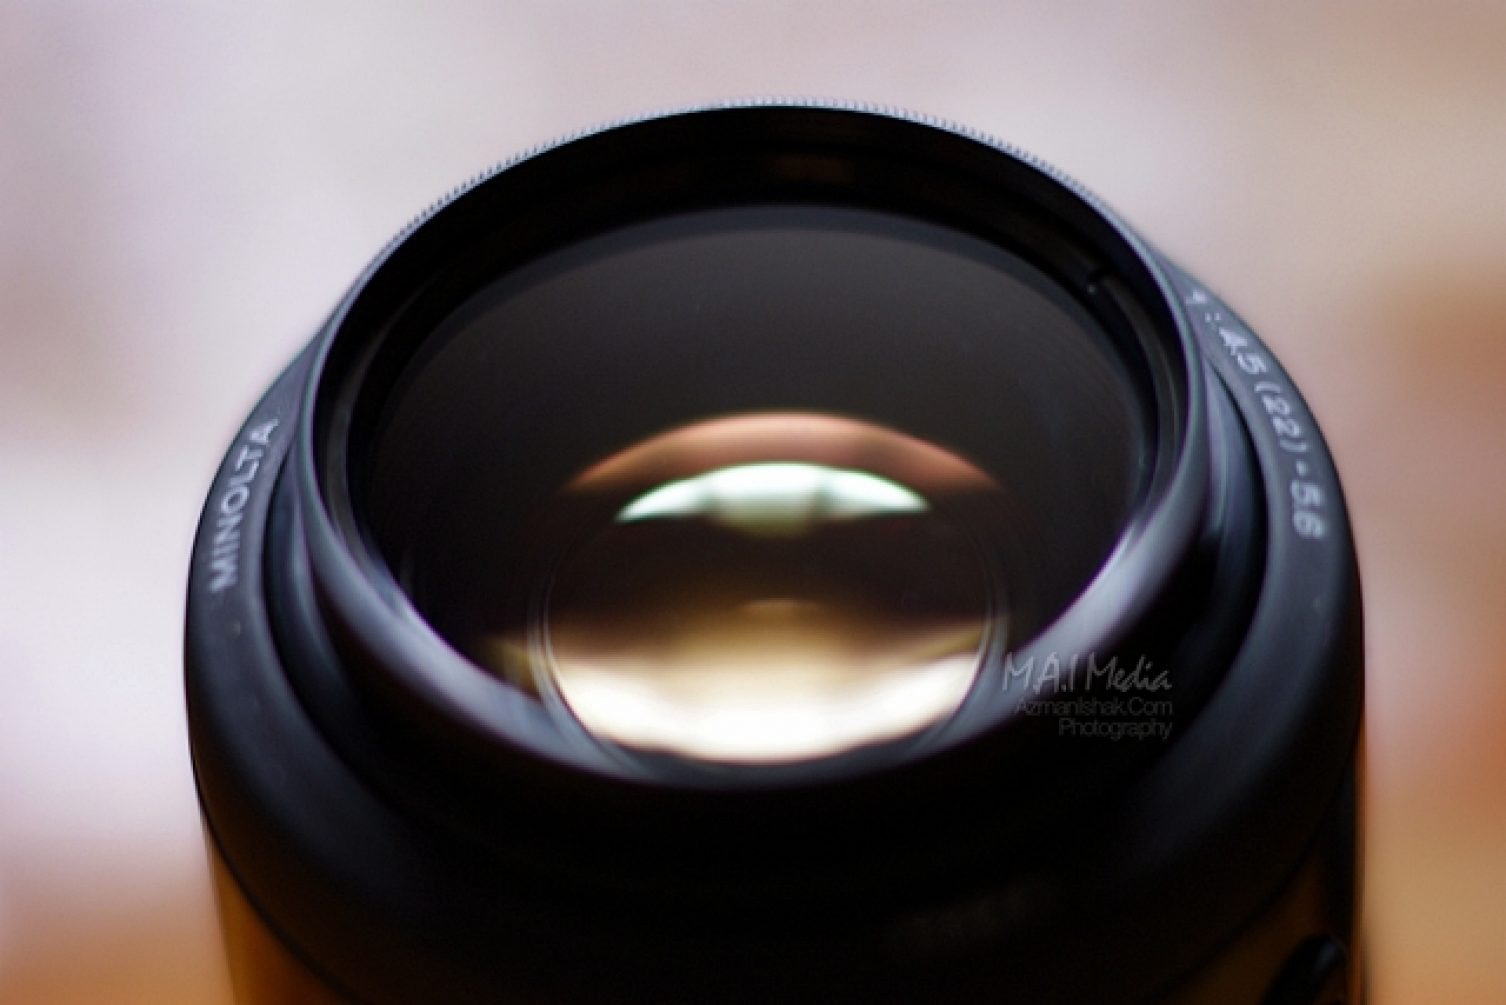 [SOLD Already] : Minolta 70-210mm – AF Lens – Sony Alpha Mount